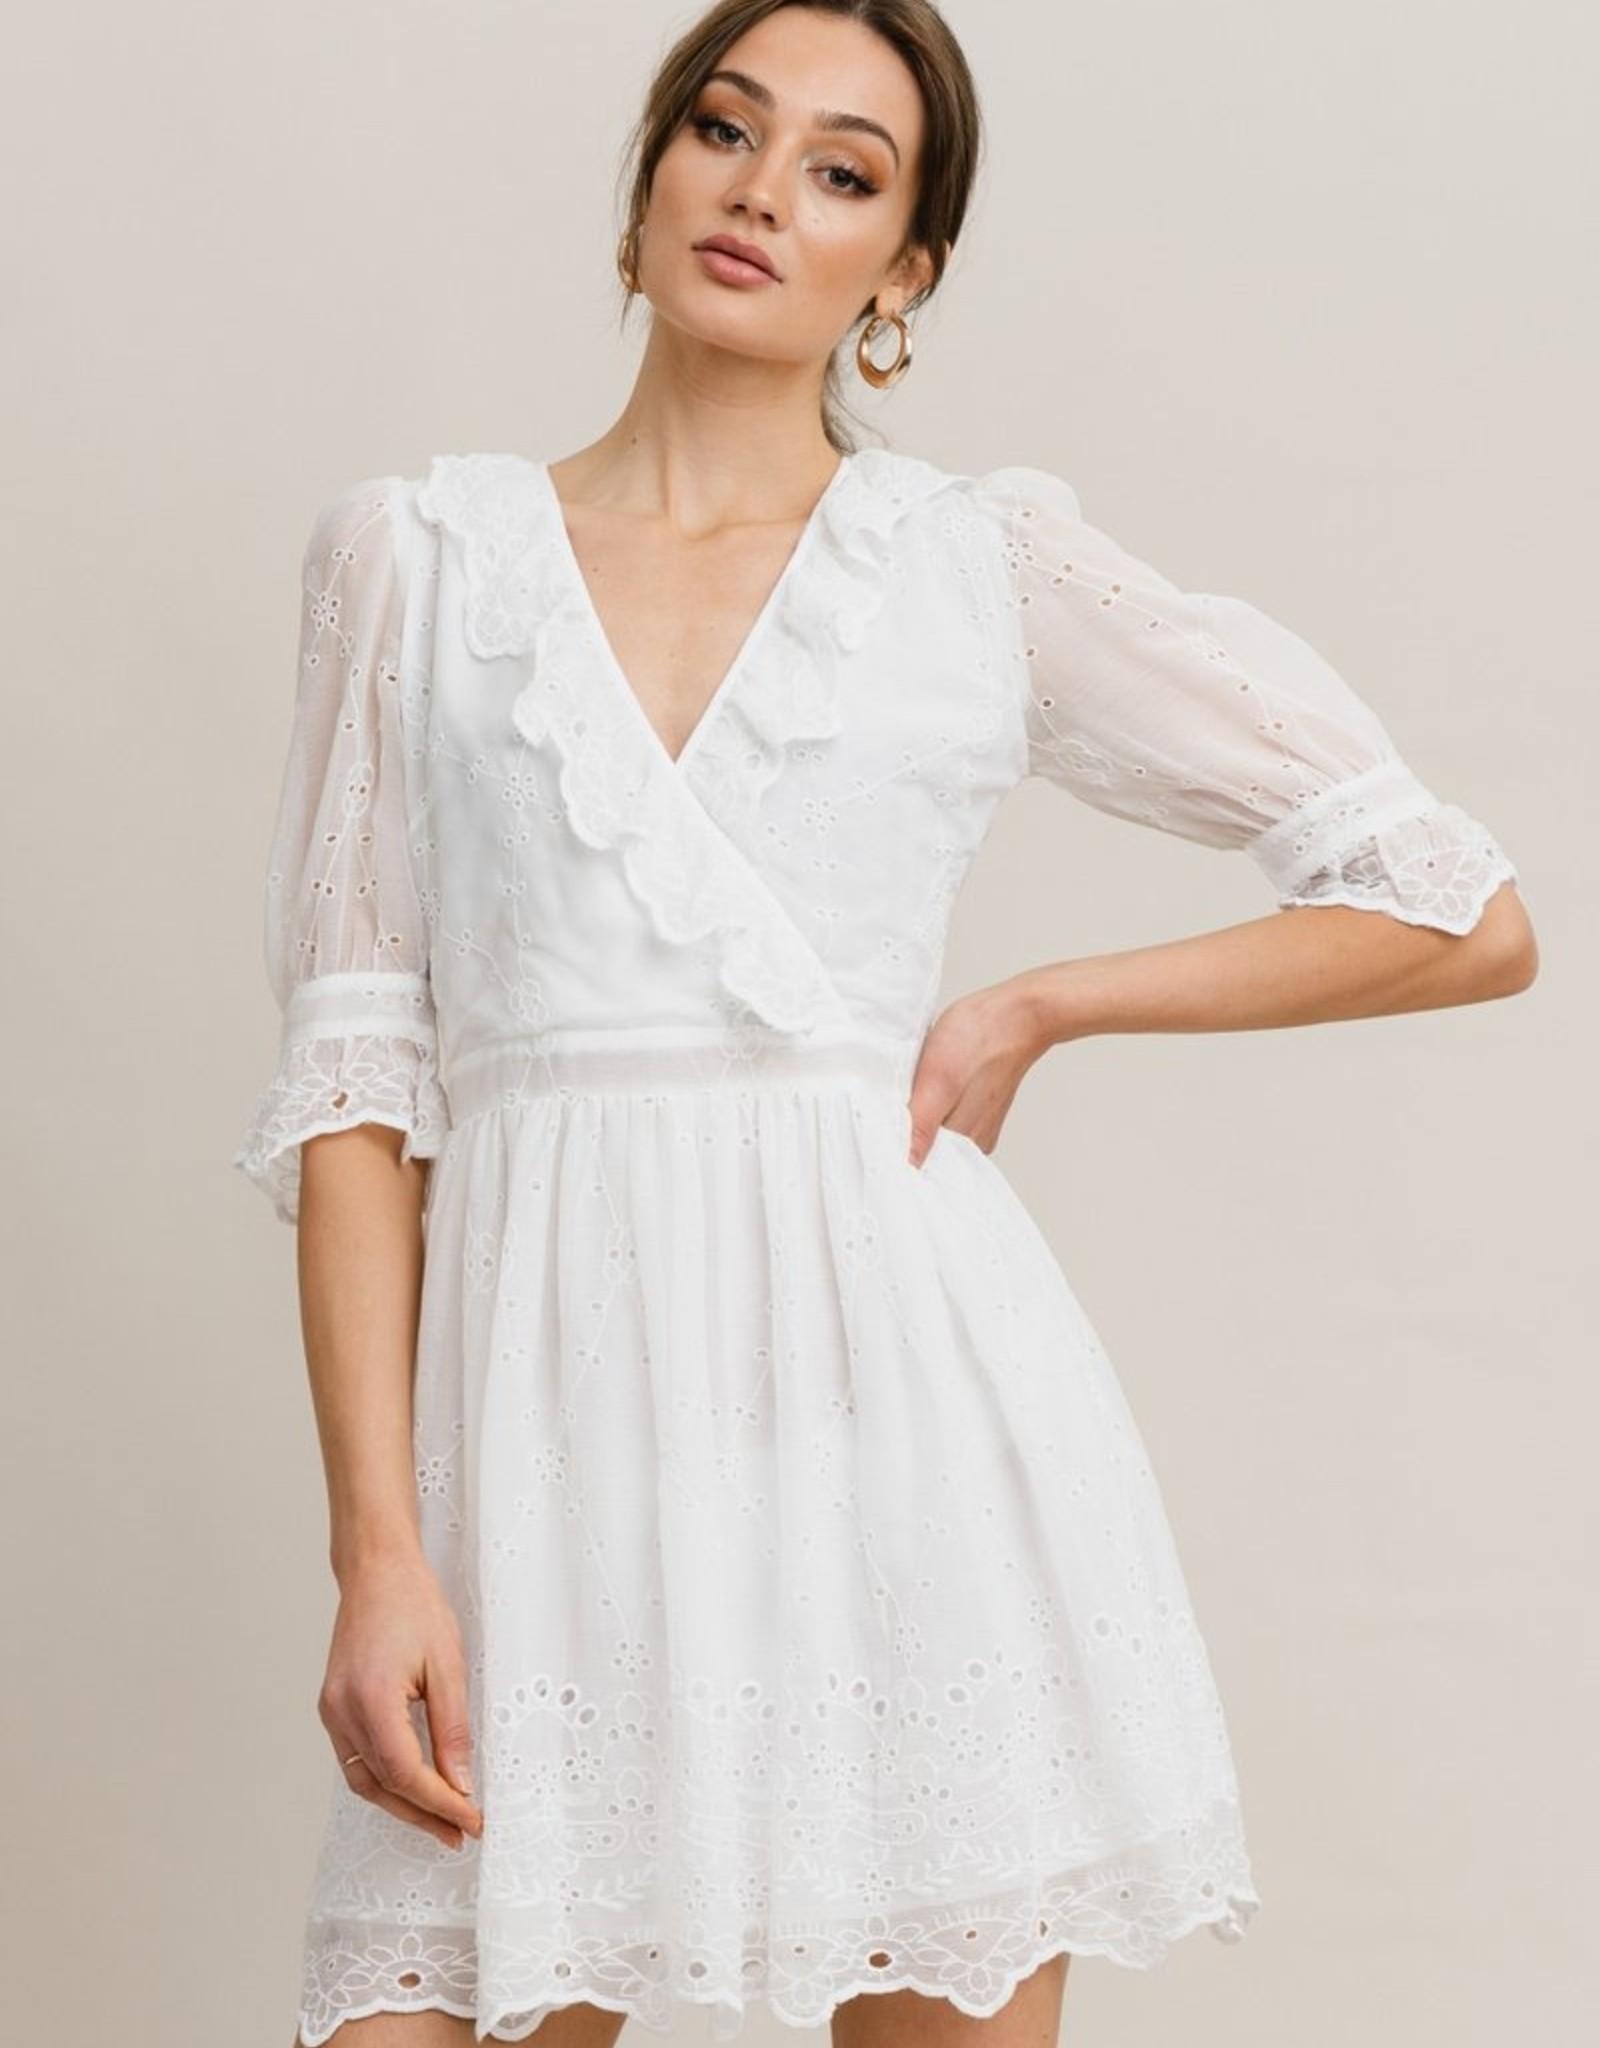 Rut & Circle Rut & Circle Astrid Dress